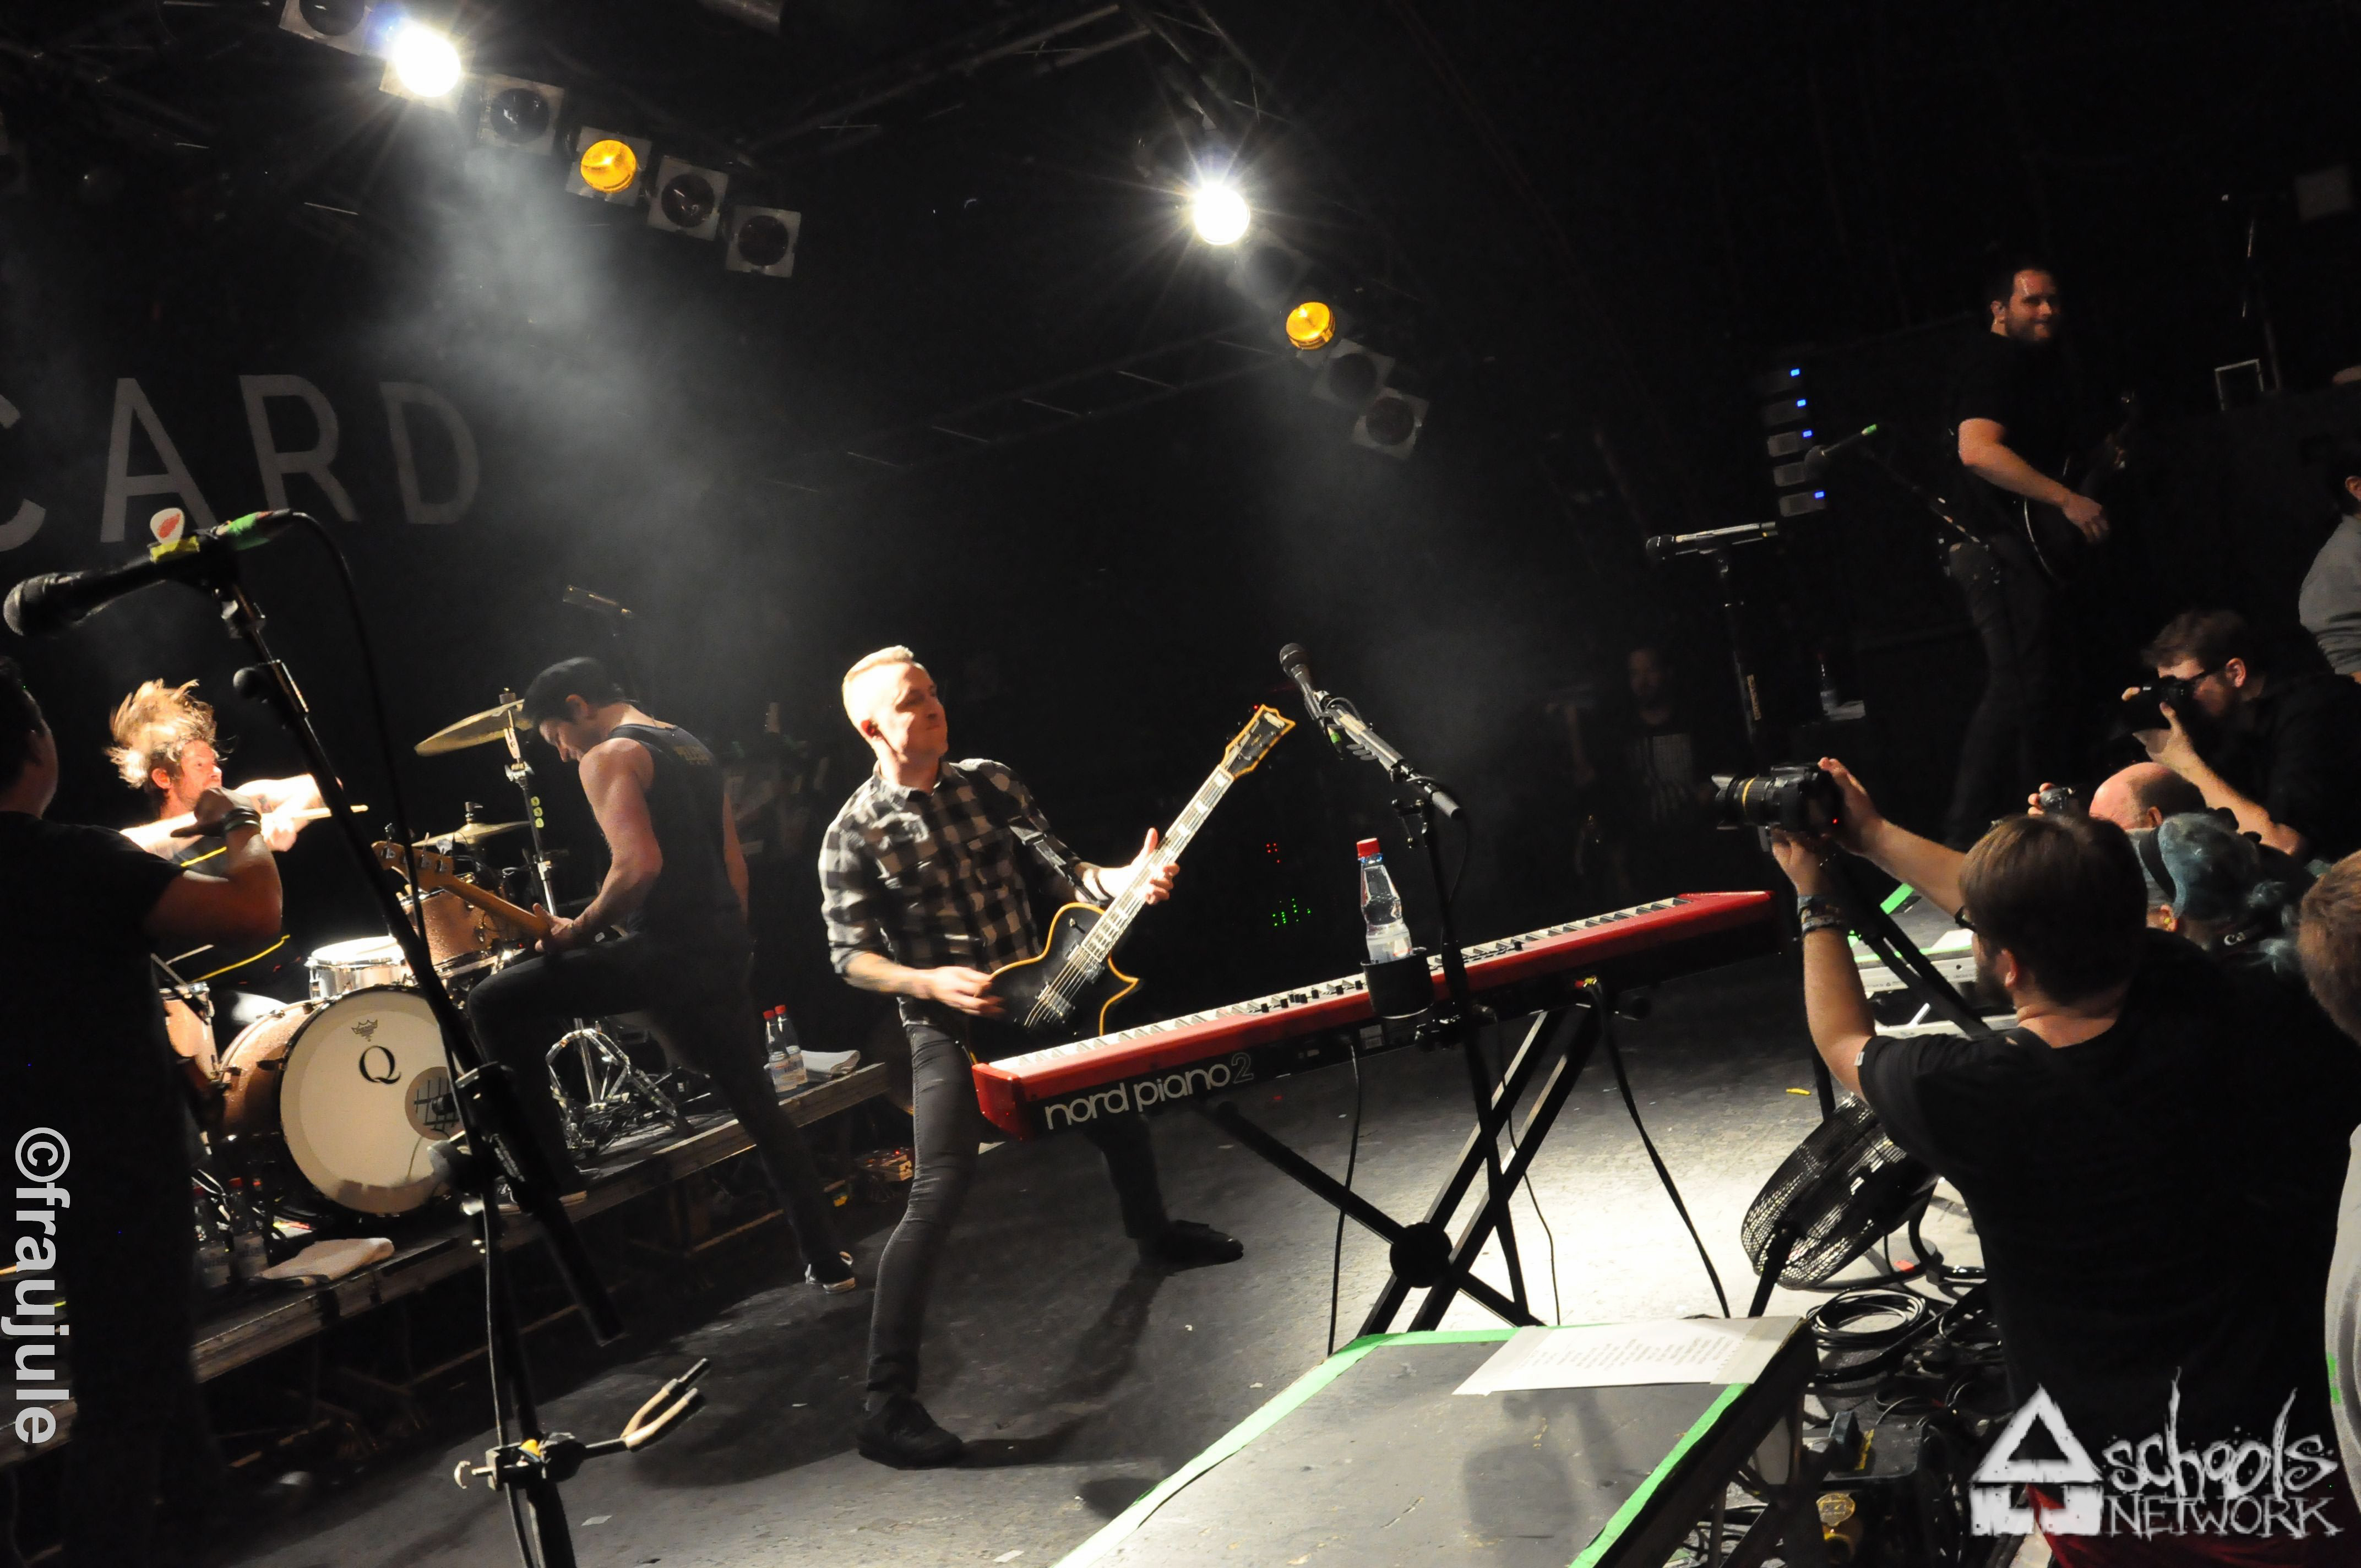 Photo zu 21.03.2015: Yellowcard, Less Than Jake, Chunk! No, Captain Chunk! - Hamburg - Markthalle